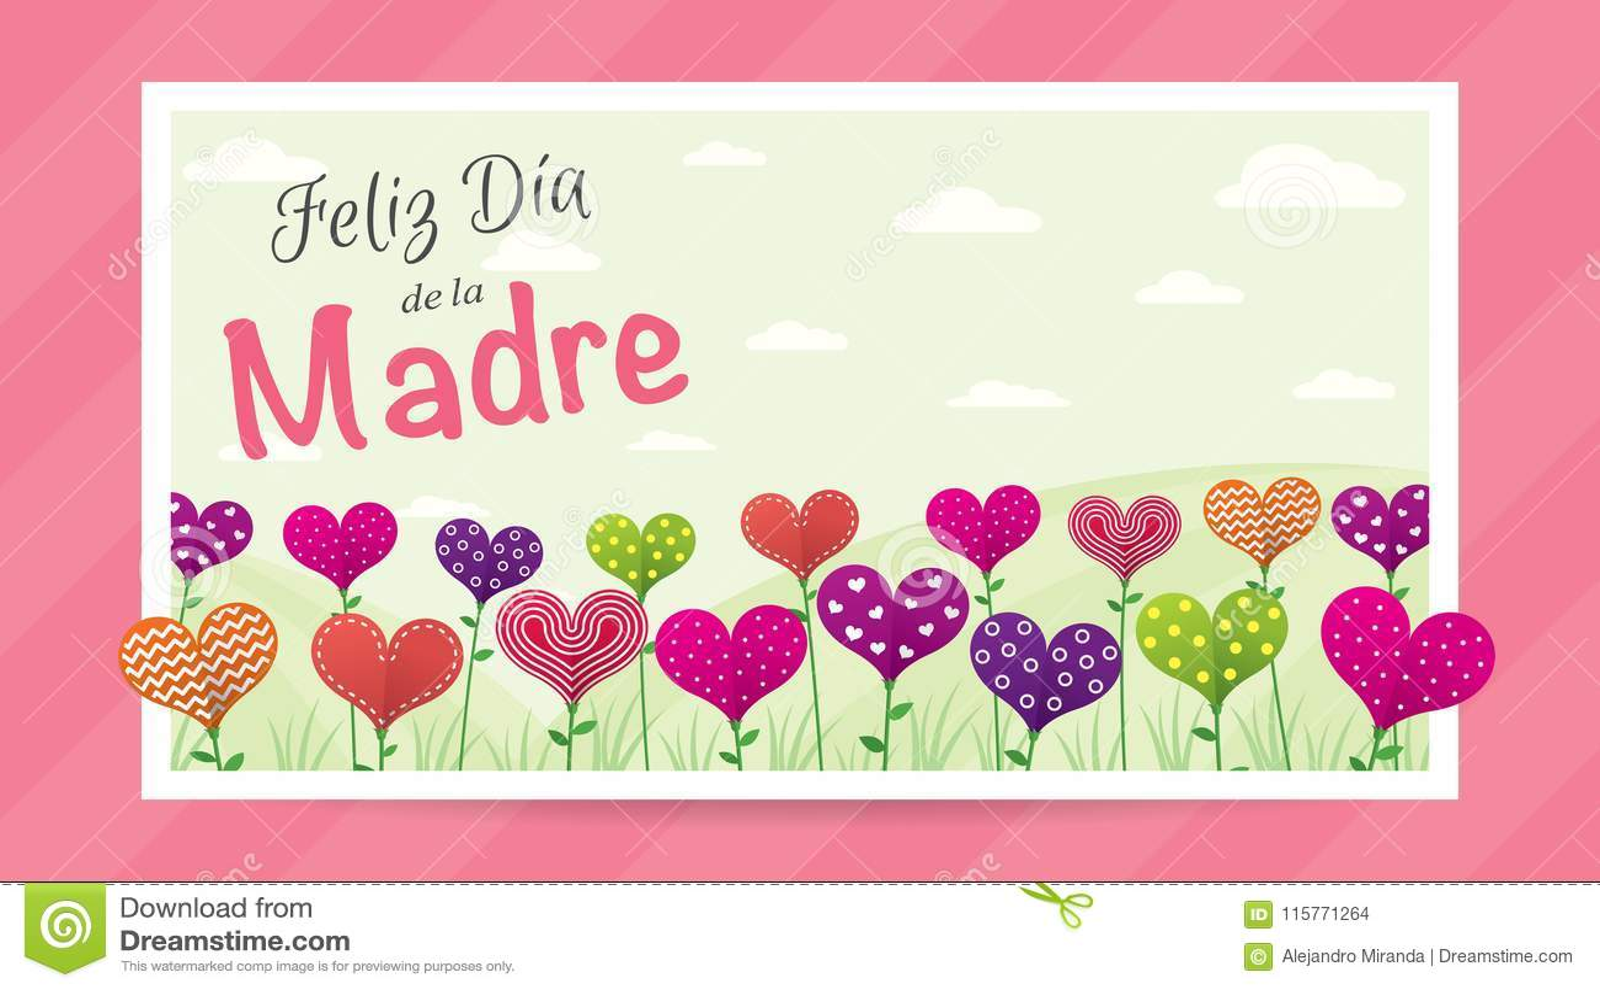 Feliz Dia de Λα Madre - ευτυχής ημέρα μητέρων ` s στην ισπανική γλώσσα - ευχετήρια κάρτα Τομέας των λουλουδιών με μορφή μιας καρδ